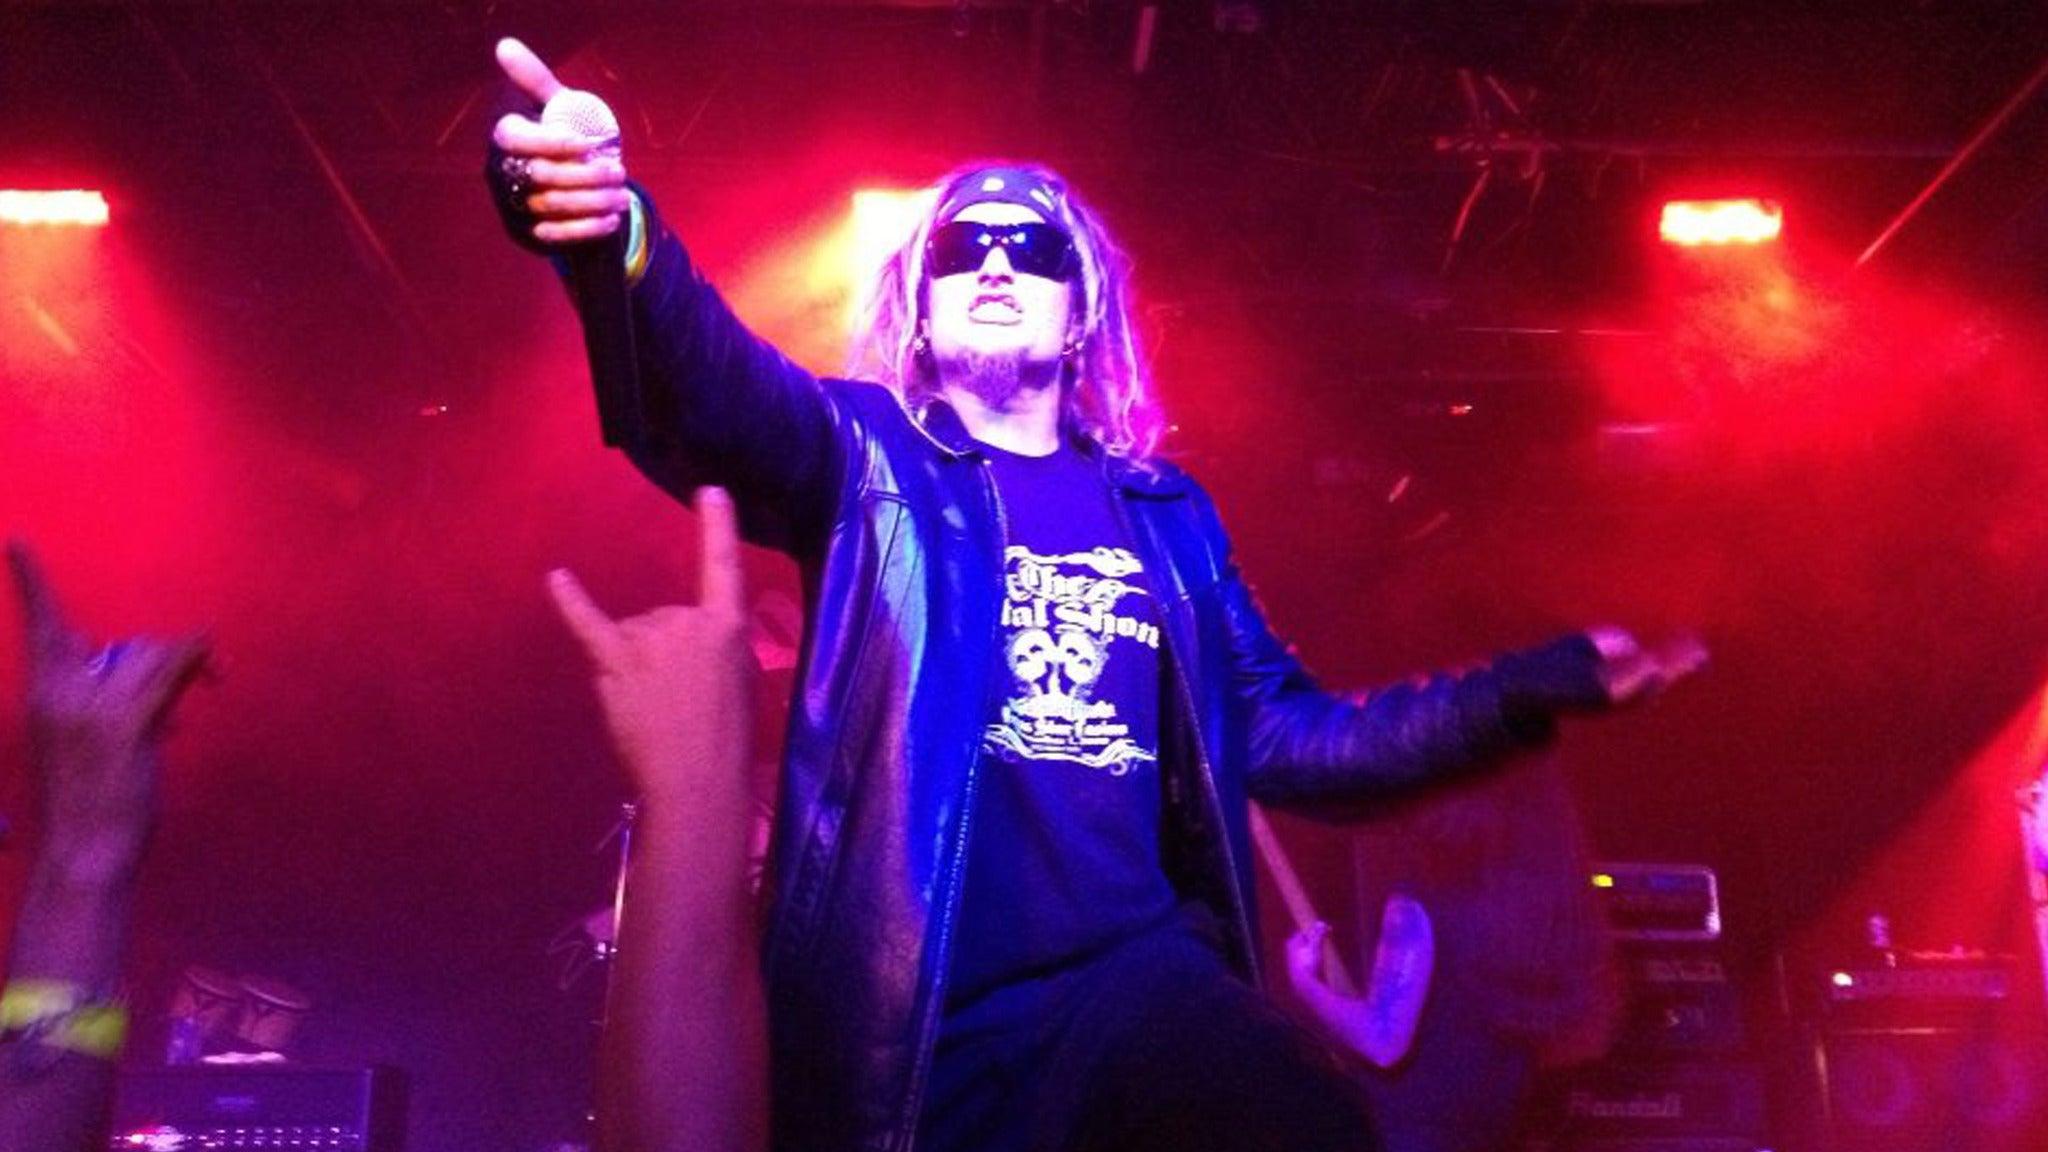 Grungefest: A Tribute To 90's Alt Music